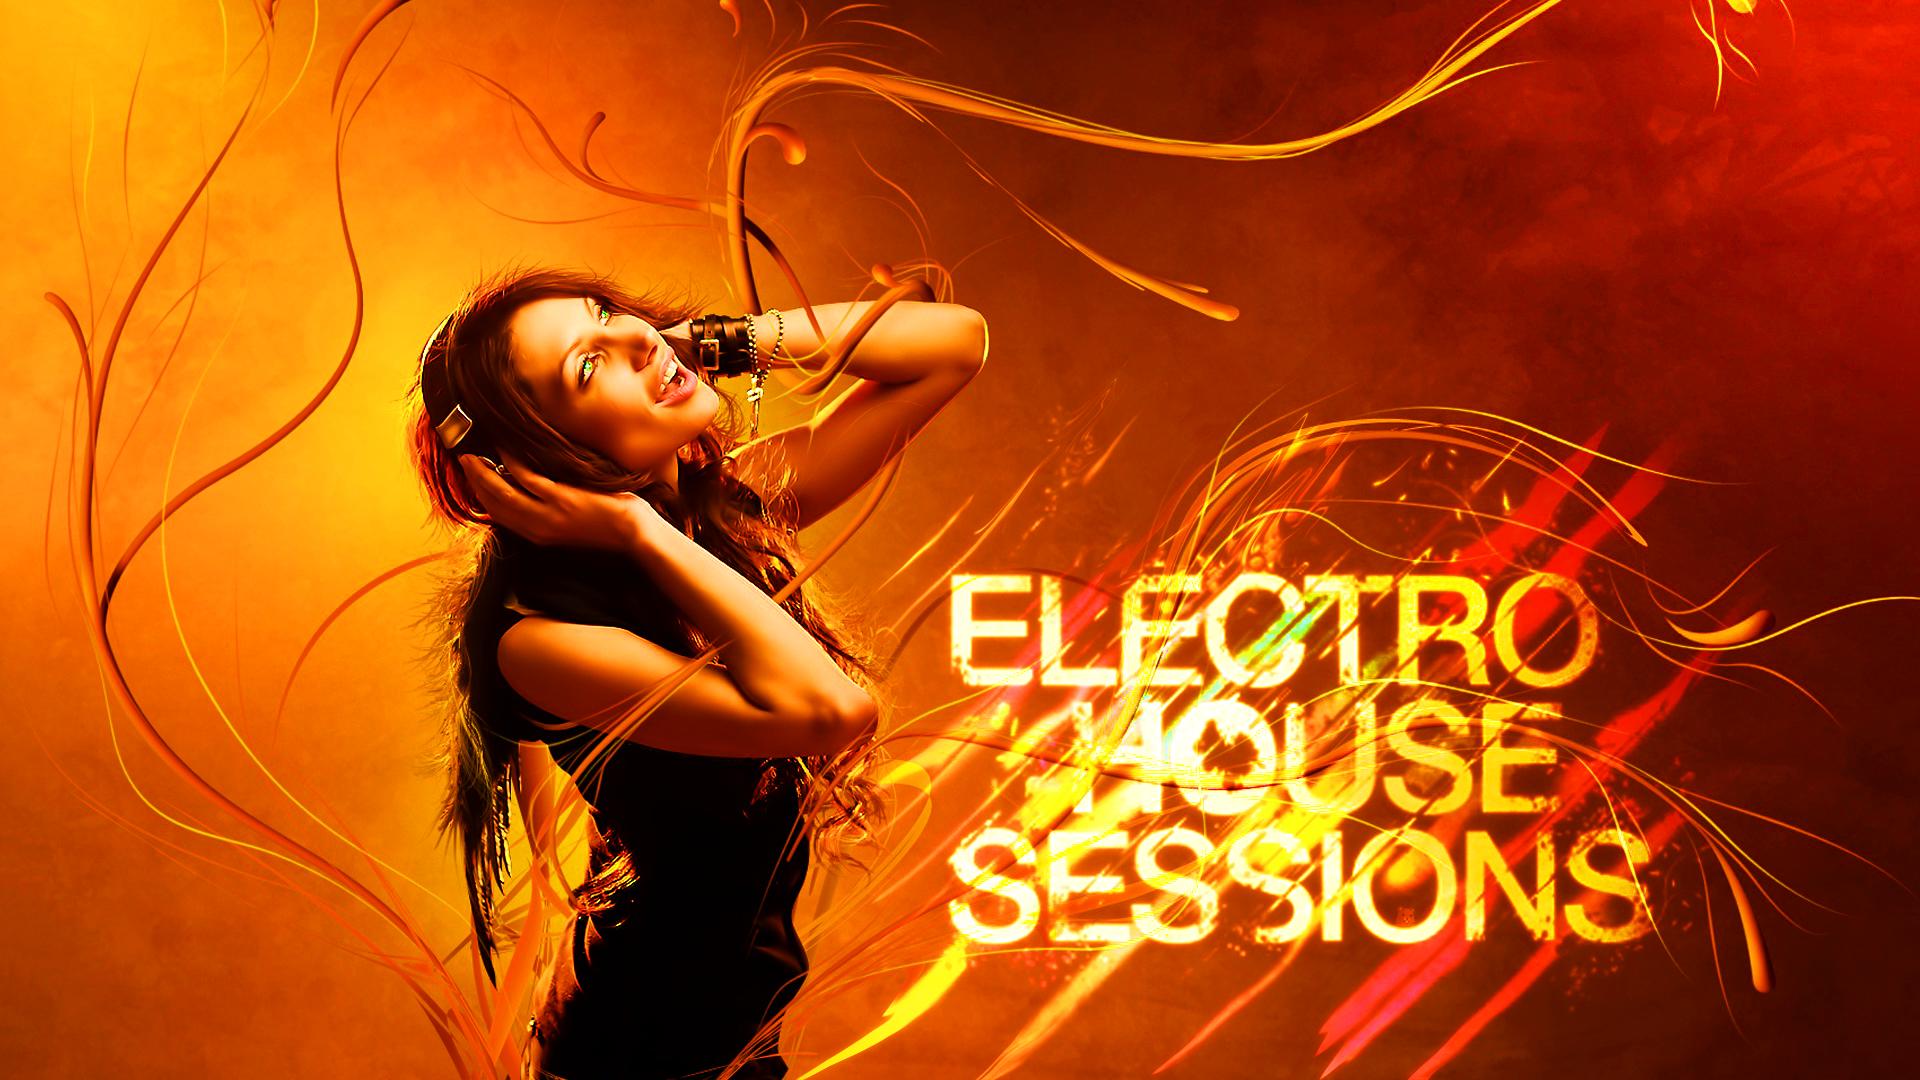 Electro music картинки фото